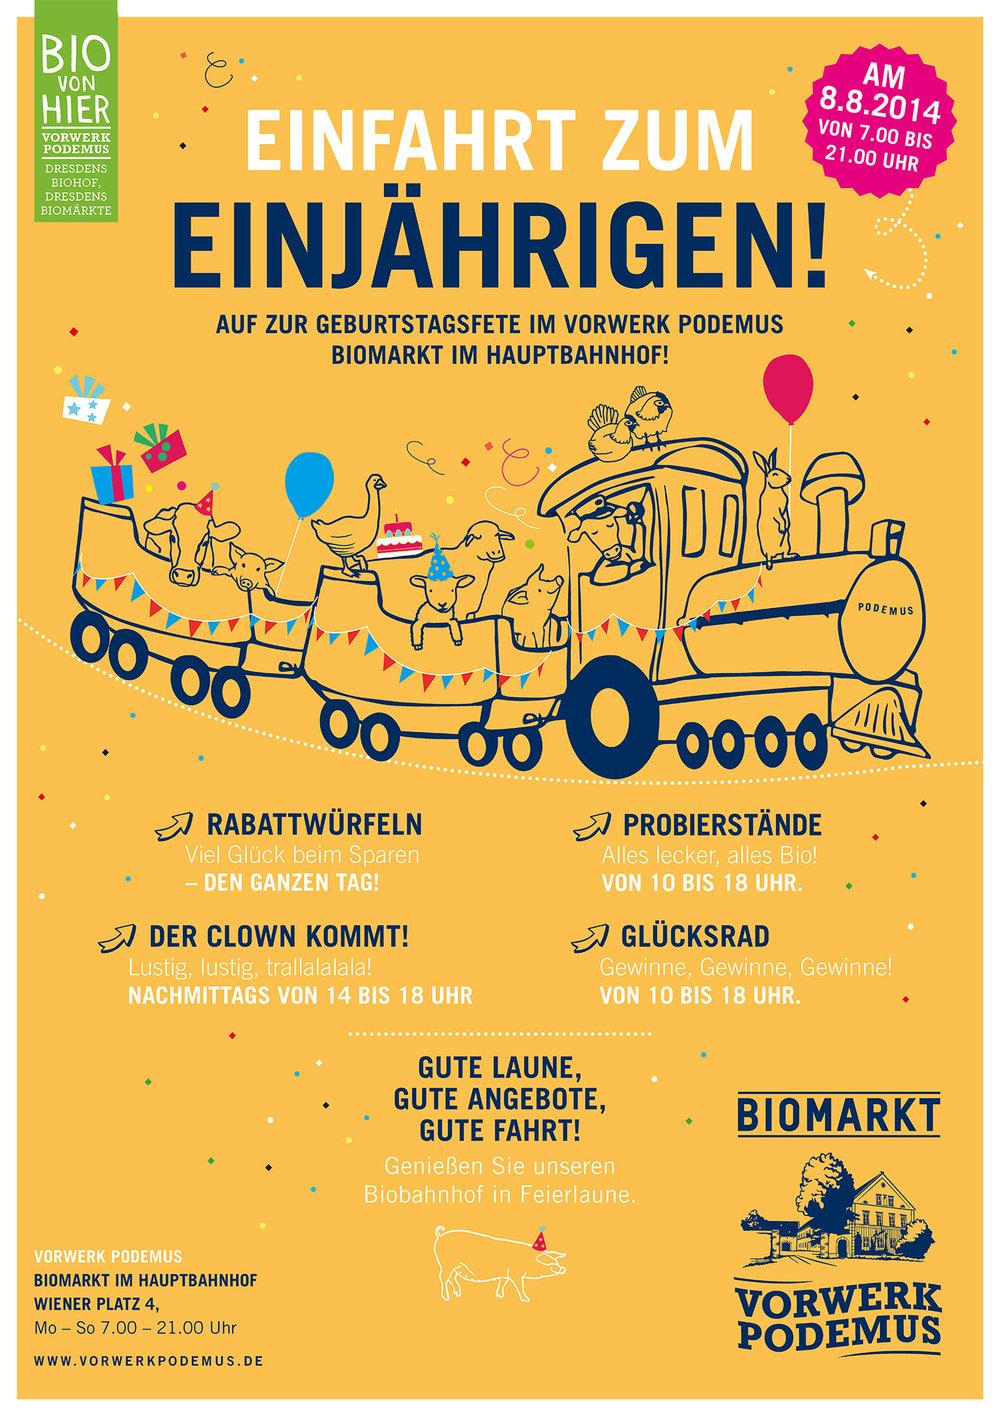 rbtq_Illustration_Seiser_Illustratorin_Hamburg_Vorwerk_Podemus_Print_Design_Plakat.jpg